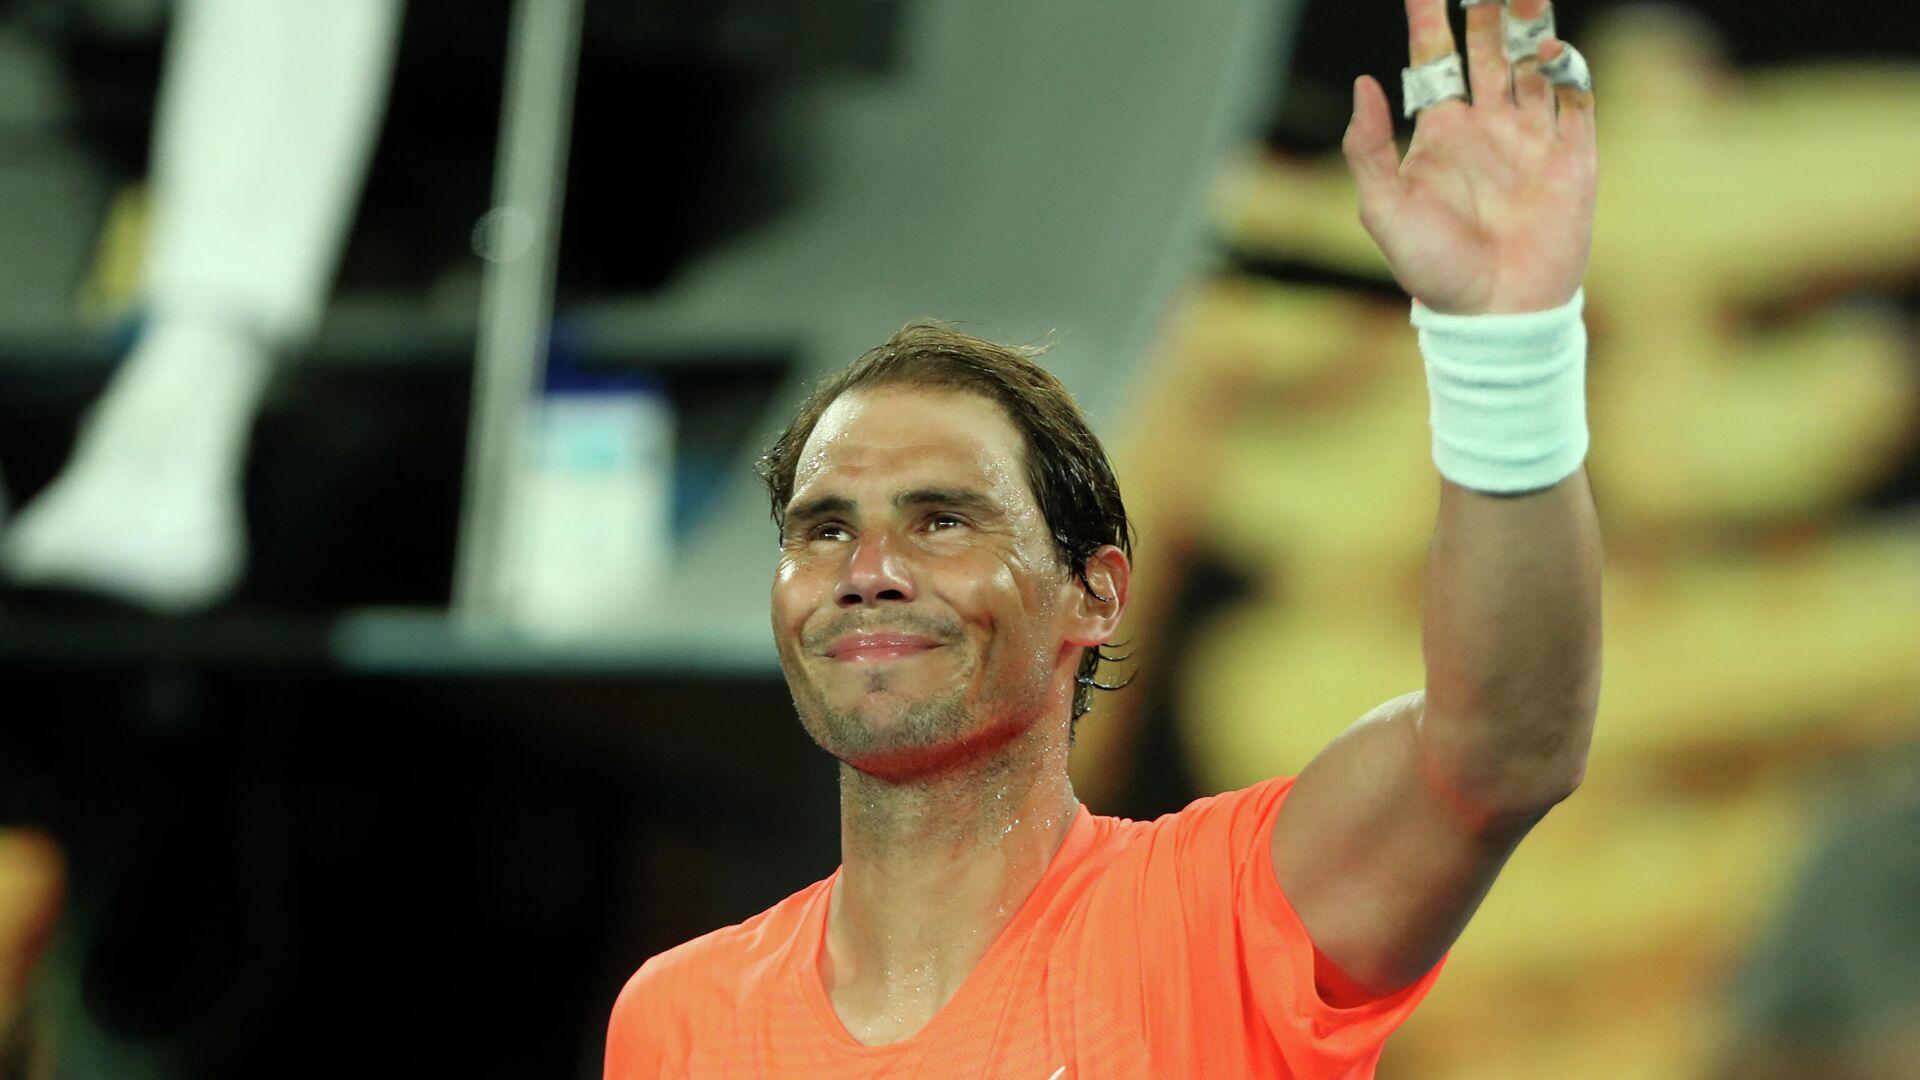 Rafa Nadal tras vencer a Michel Mmoh en el Open de Australia - Sputnik Mundo, 1920, 12.02.2021